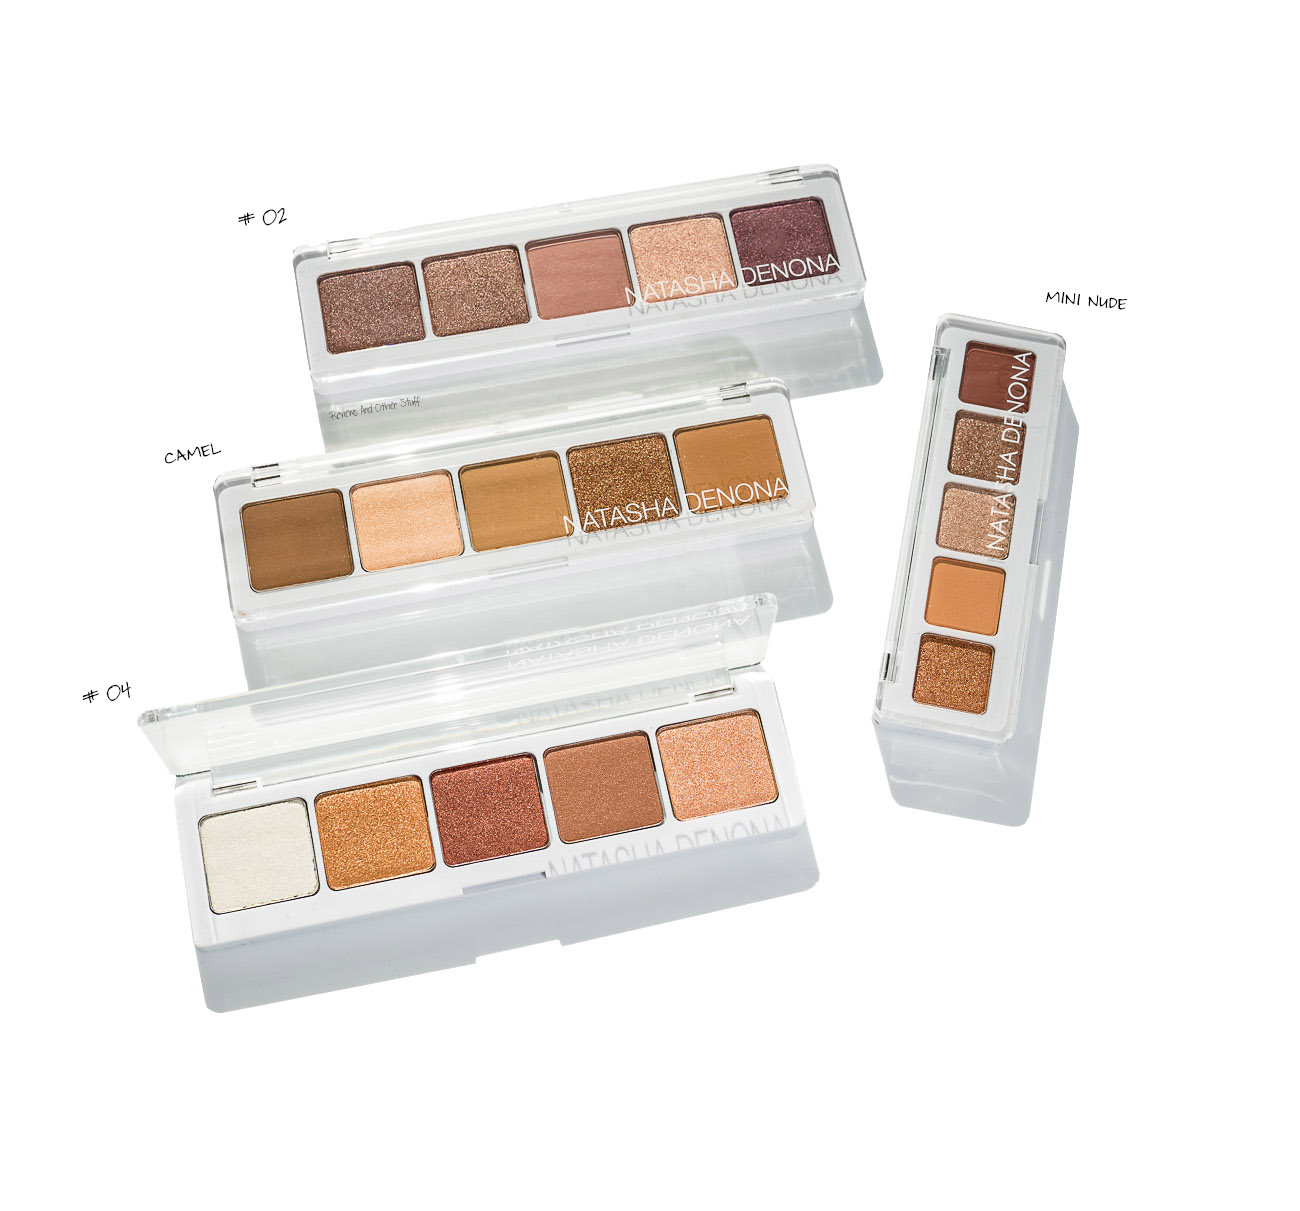 Natasha Denona Eyeshadow Palette 5 Amp Mini Nude Eyeshadow